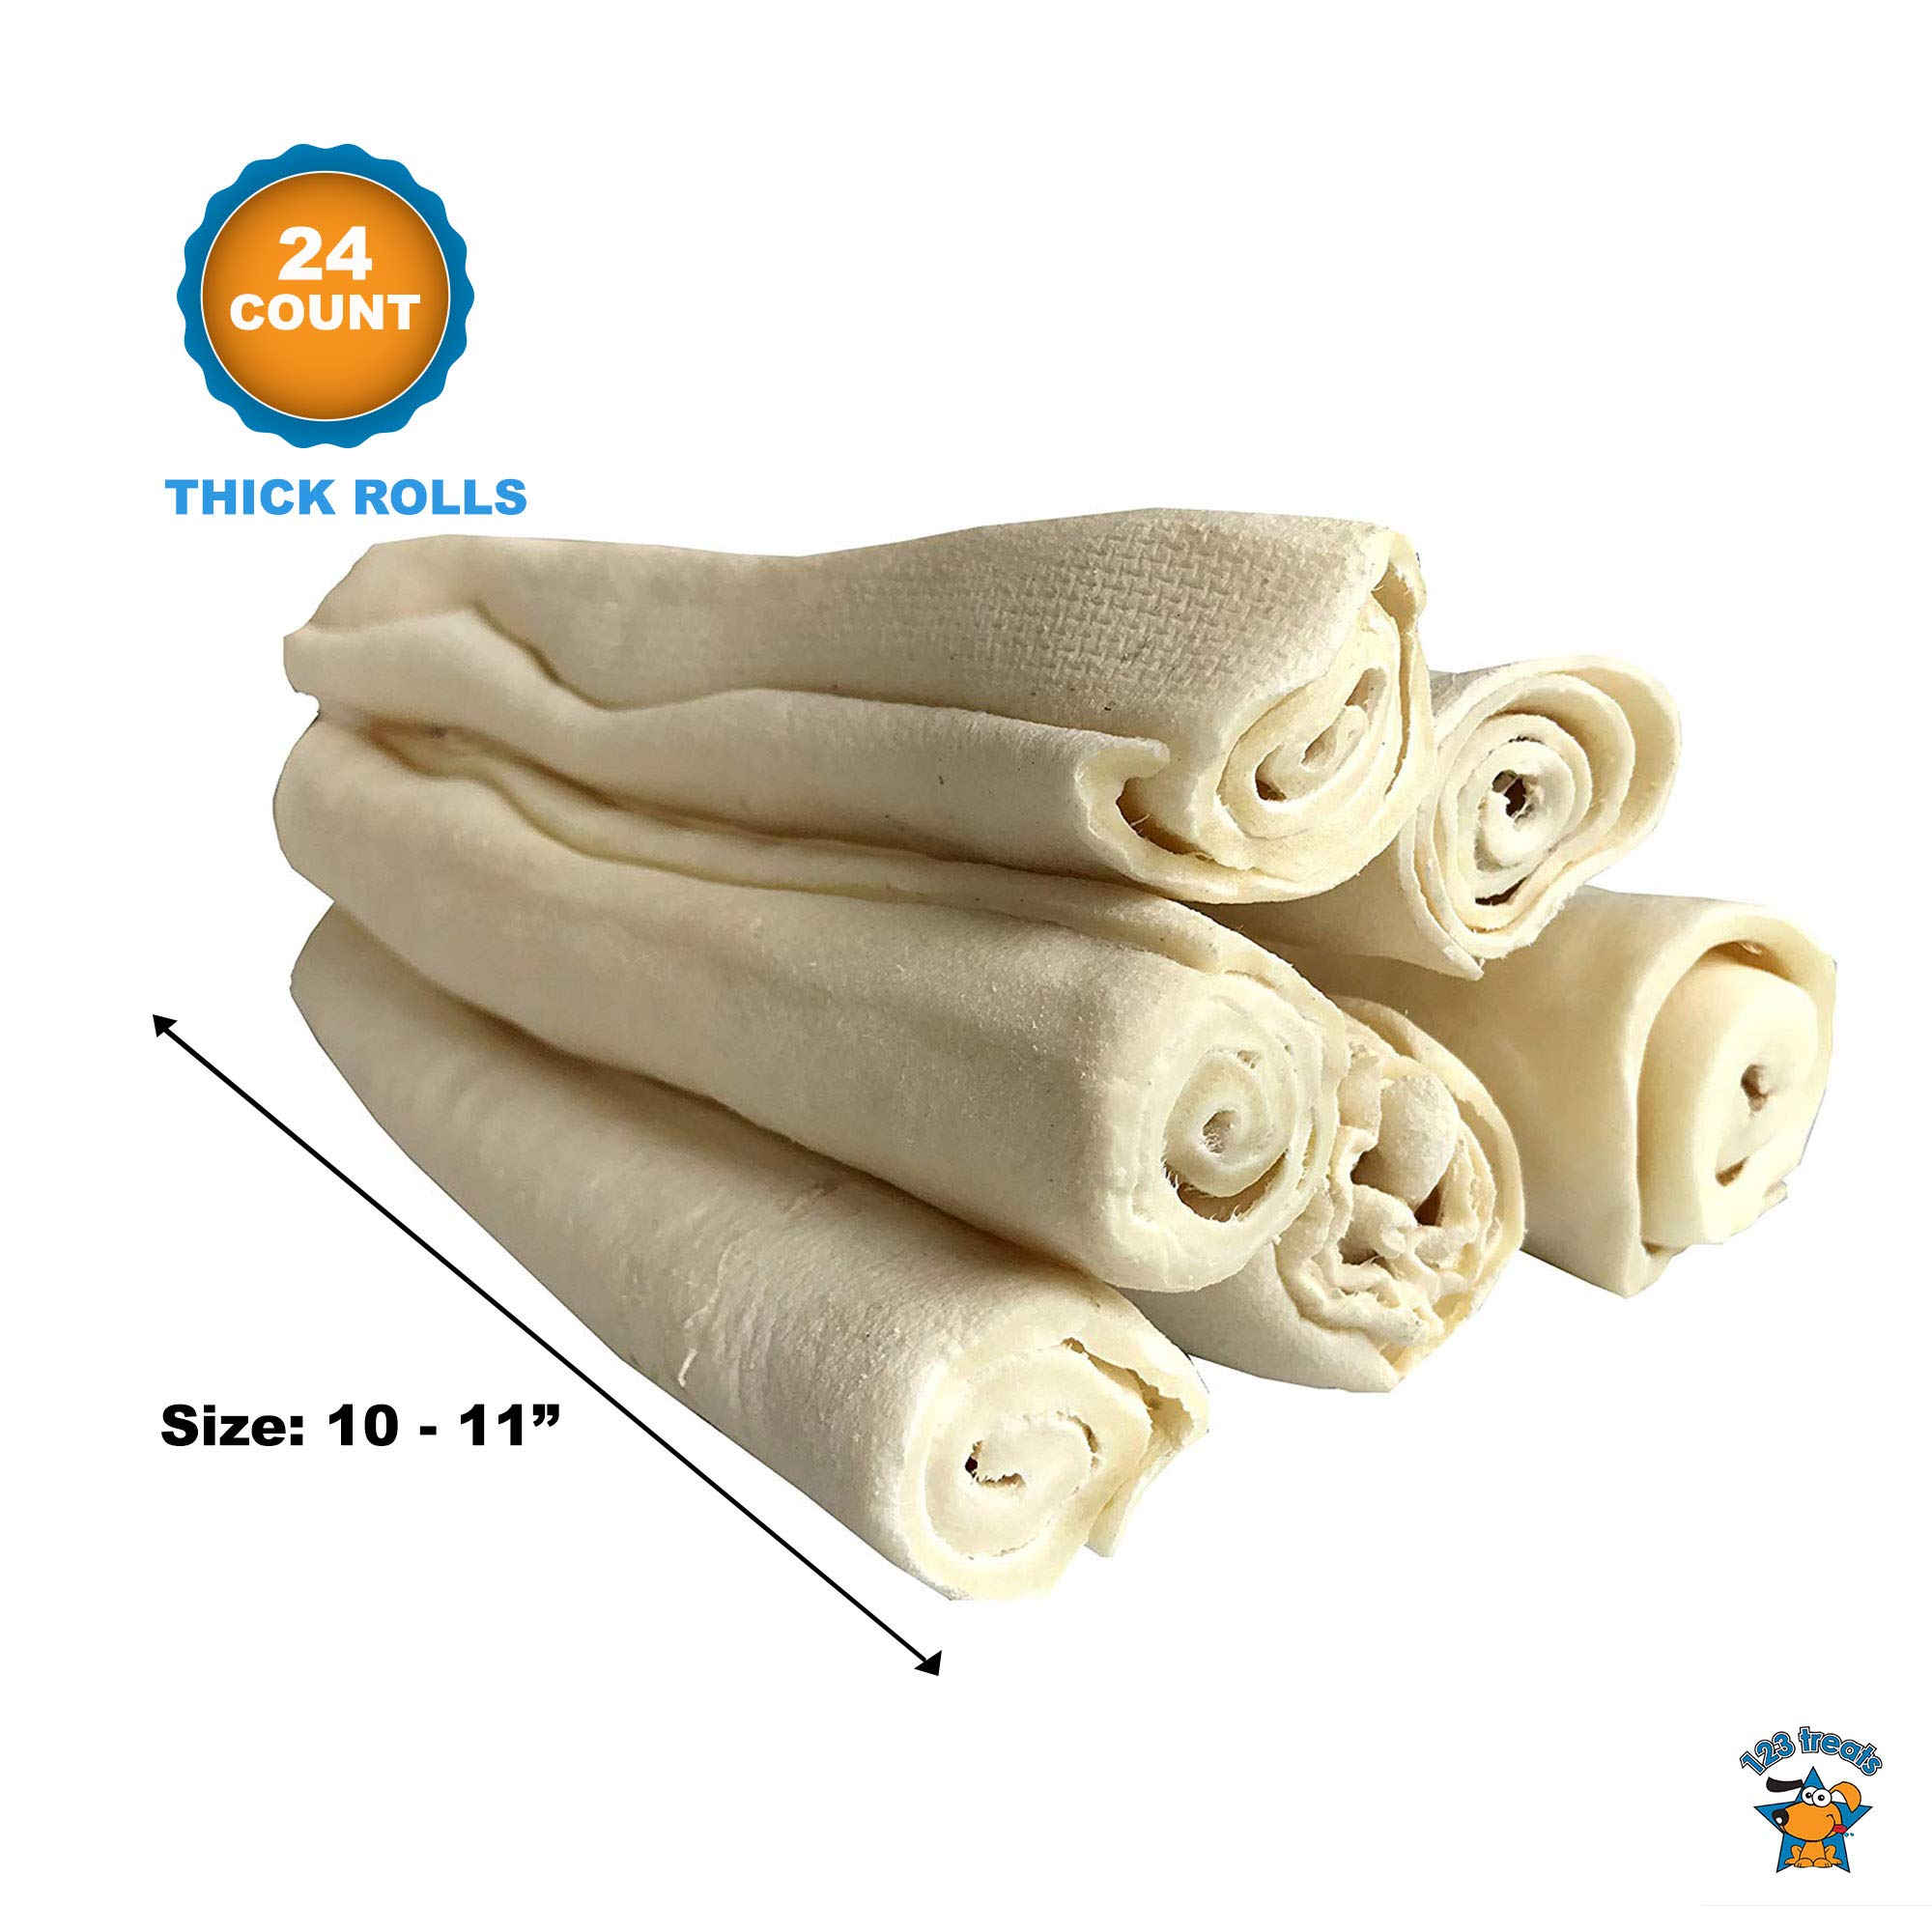 Thick Rawhide Retriever Roll Bulk - 24 Count | 10-11'' Long | 100% Natural Rawhide Roll Dog Treats